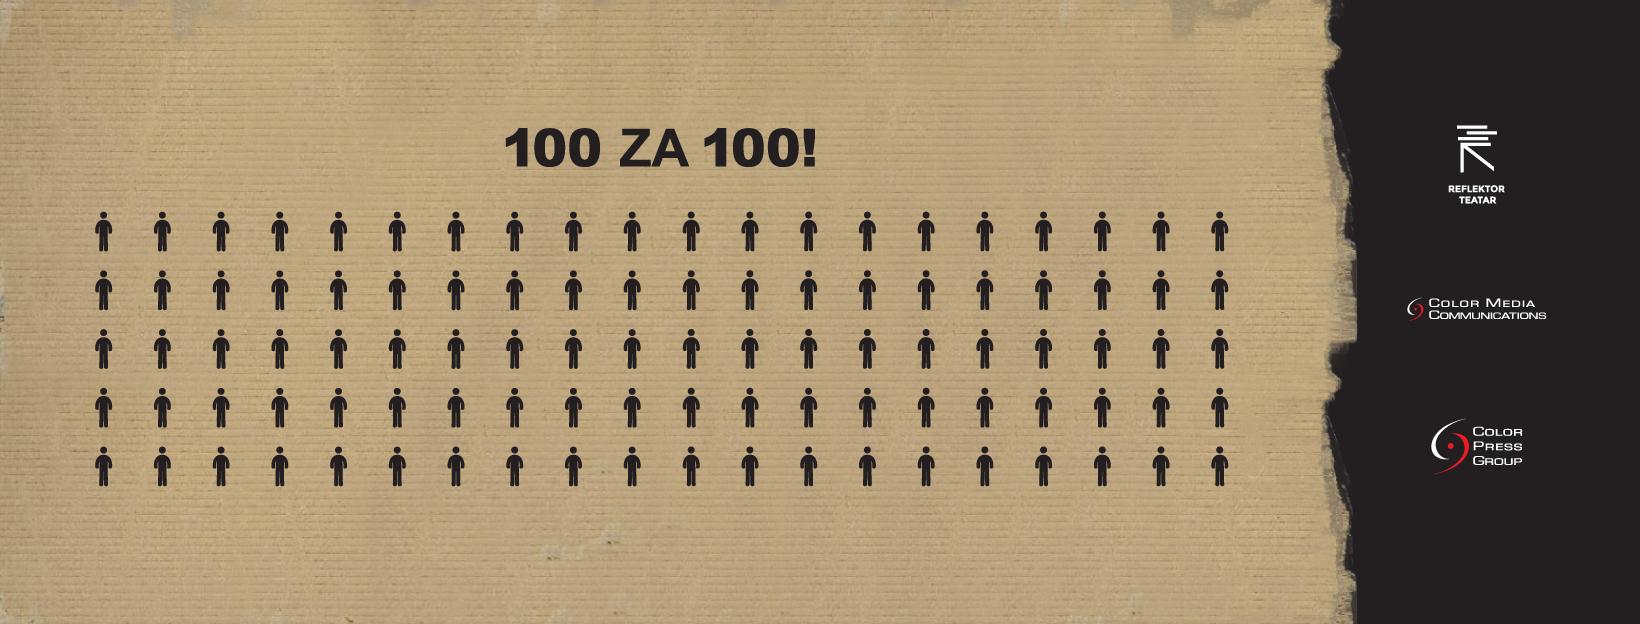 100 za 100